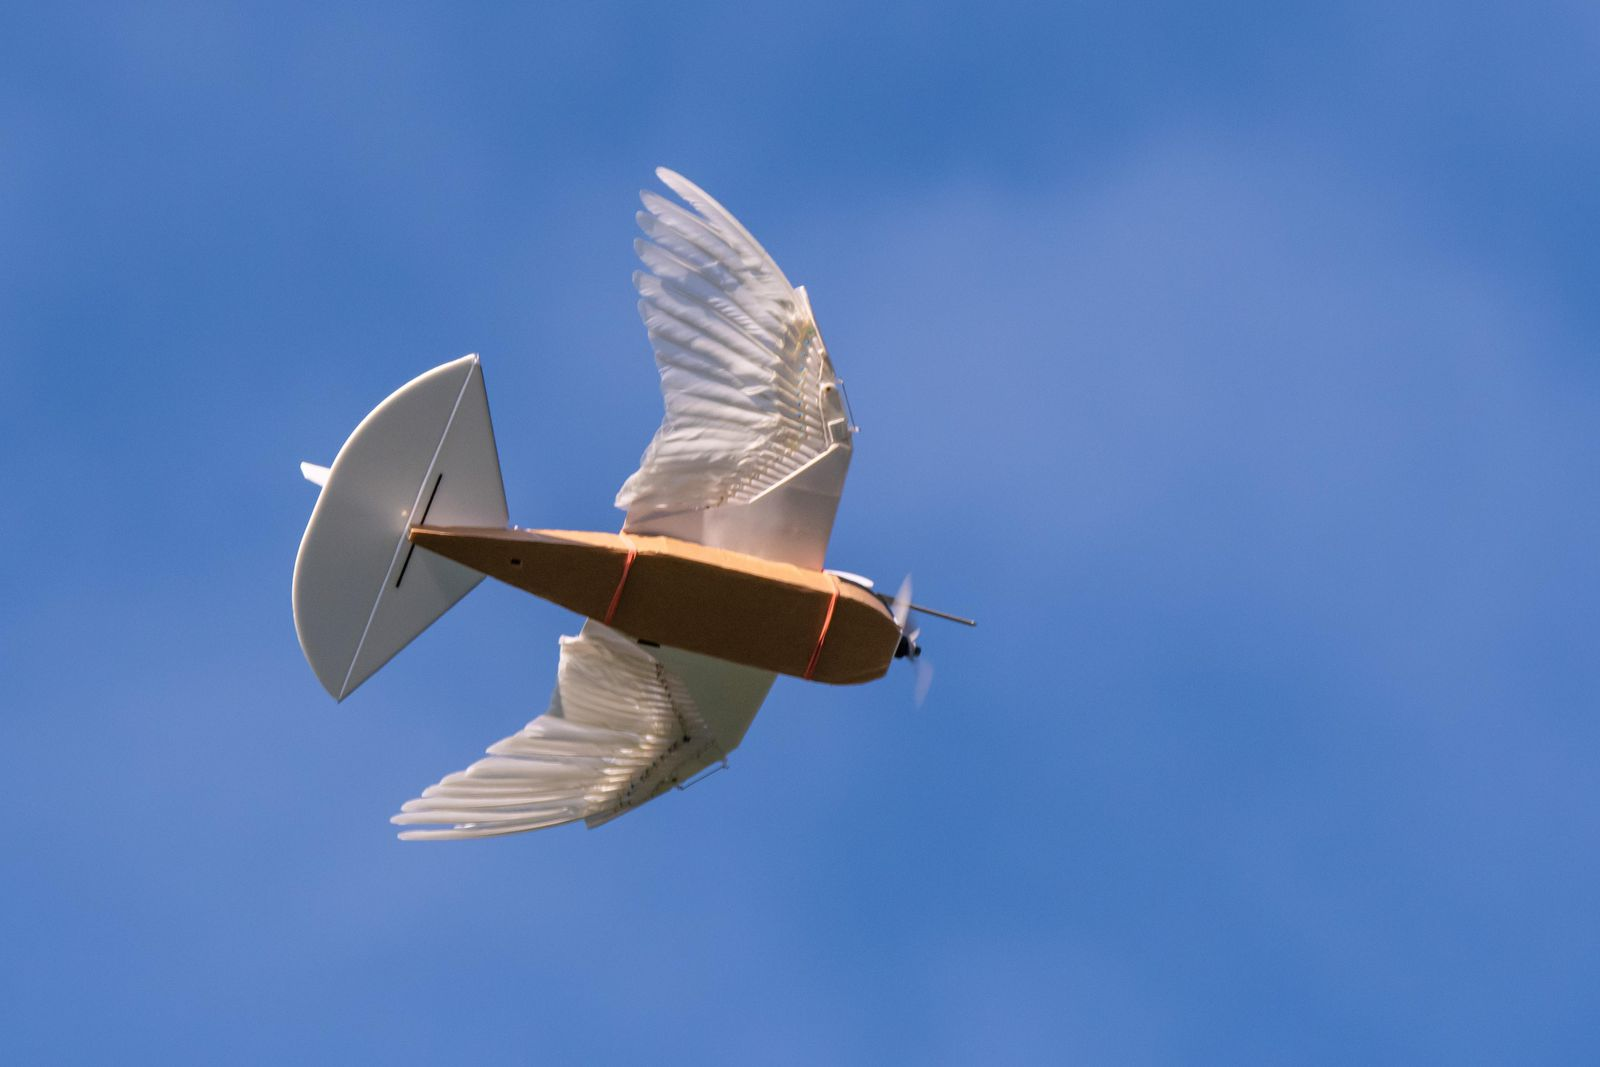 Pigeonbot